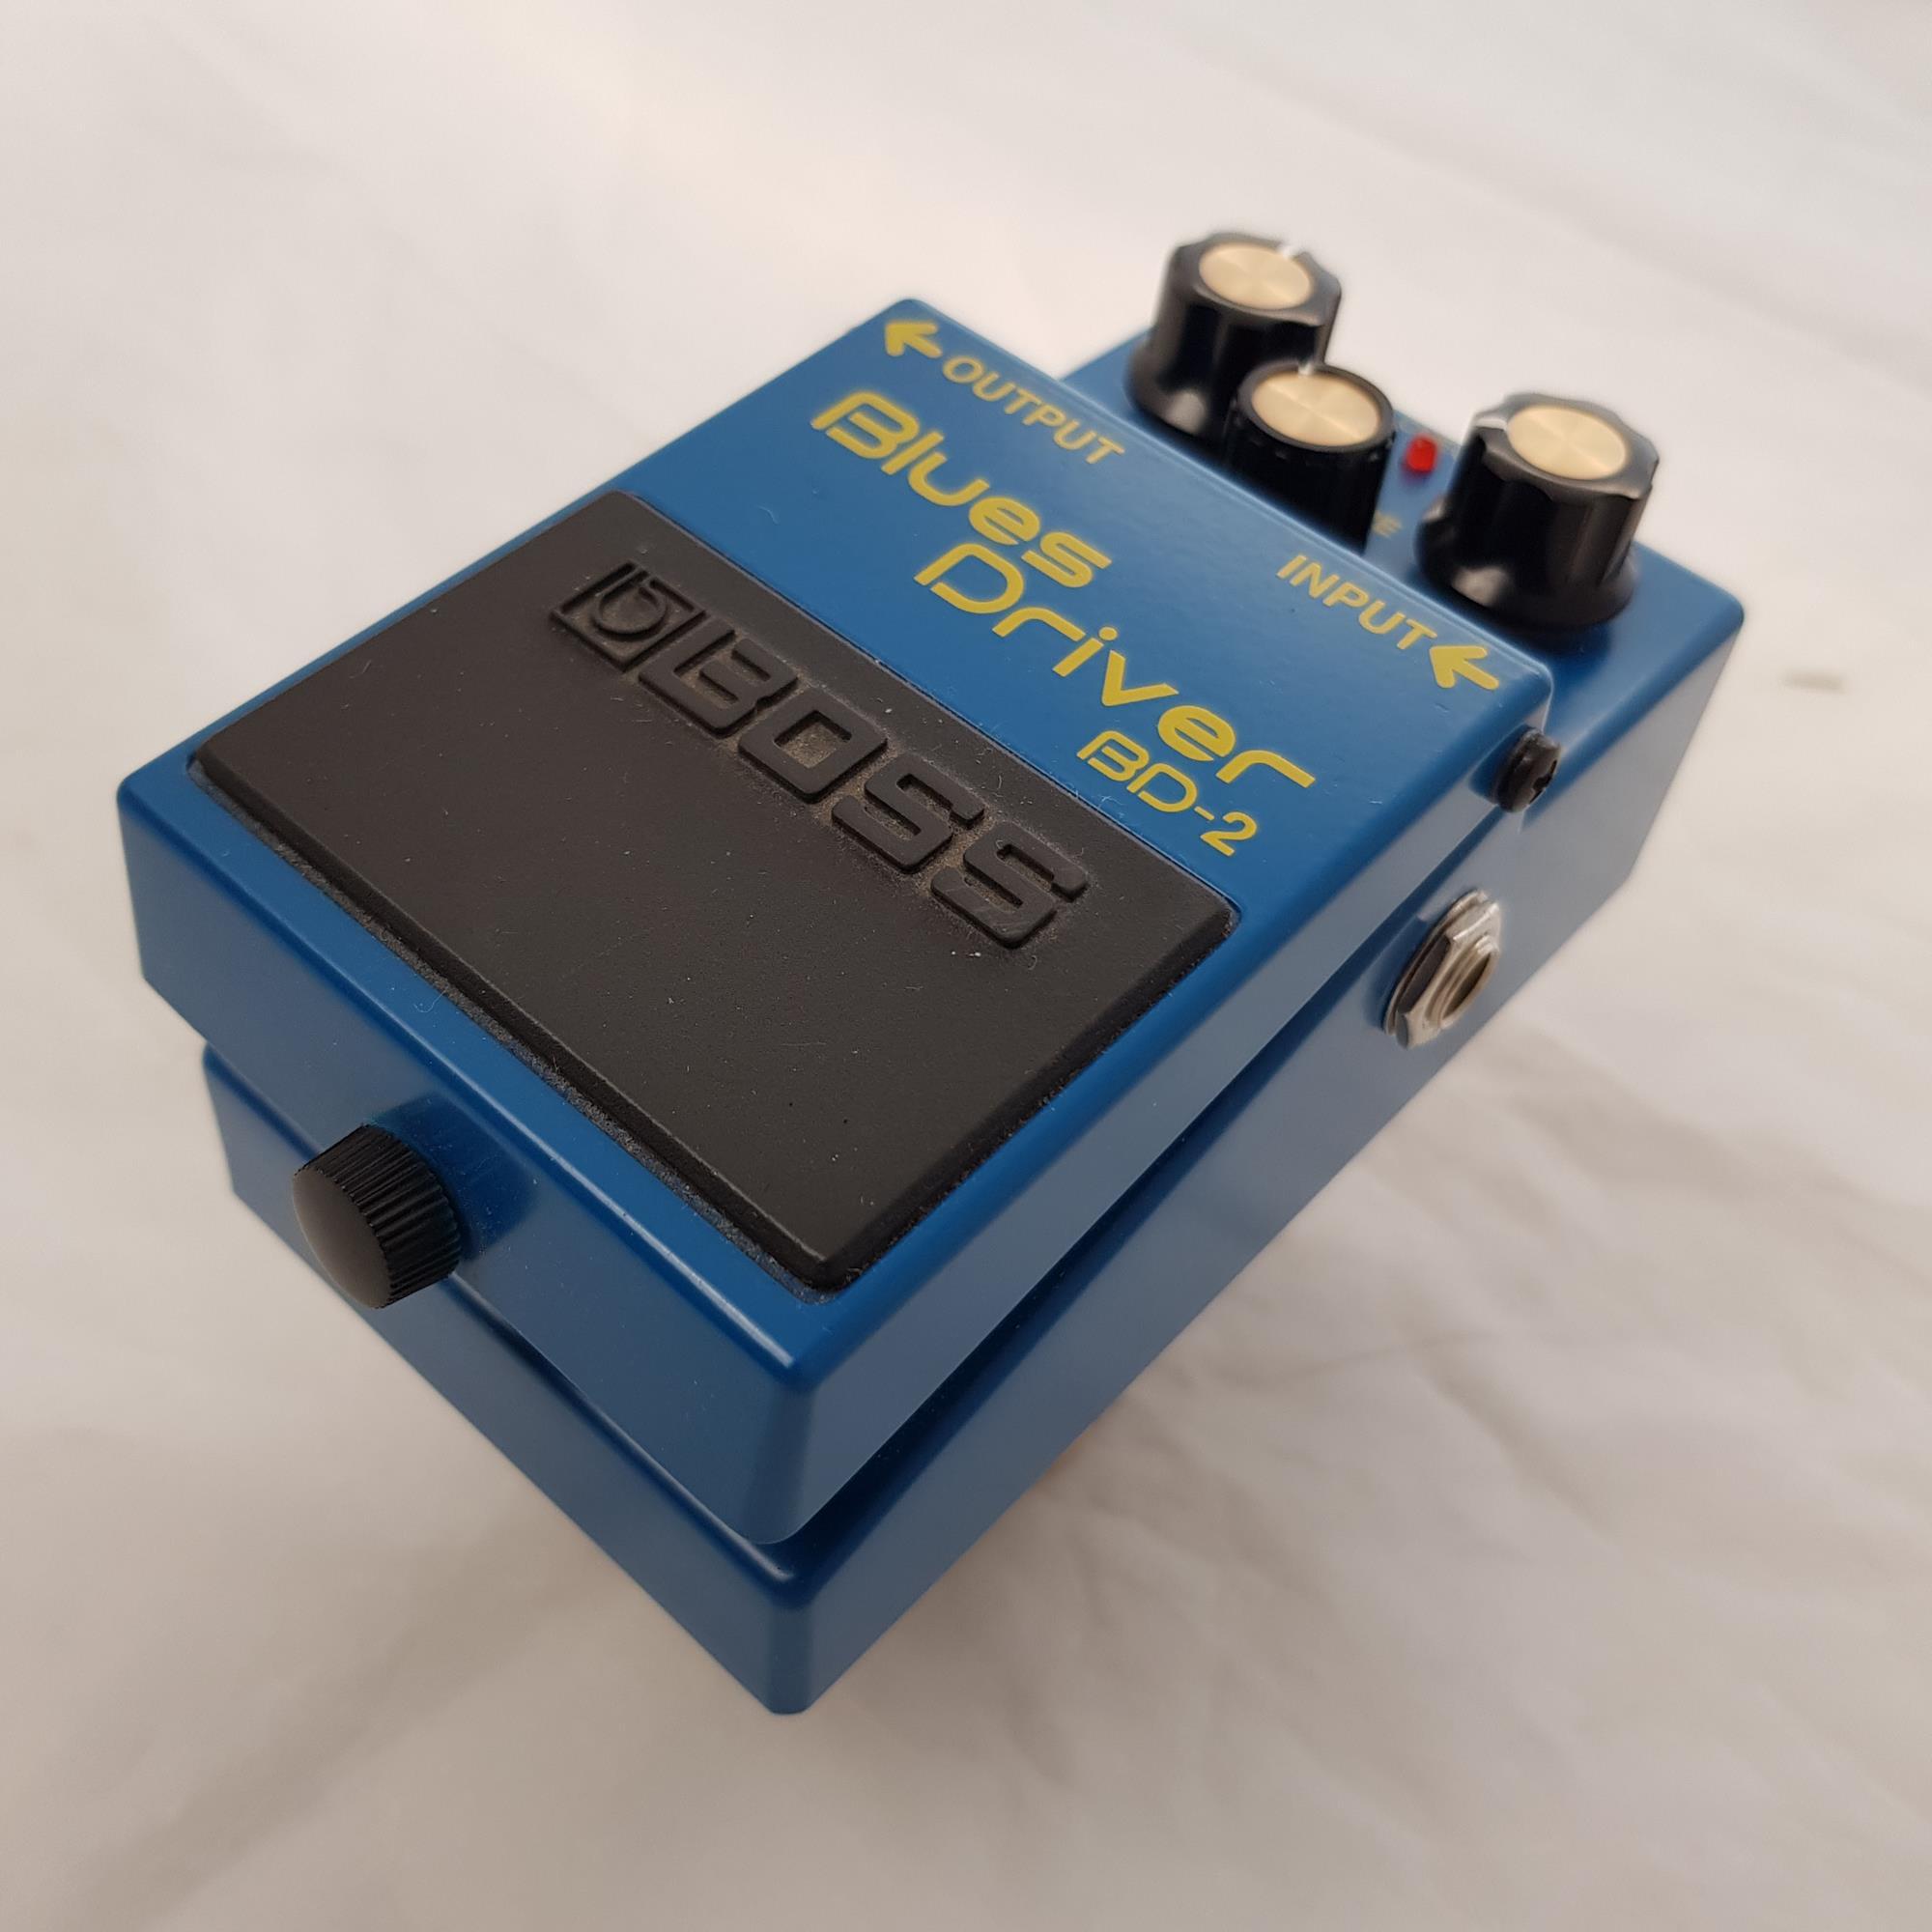 BOSS-BD-2-BLUES-DRIVER-sku-1623508370948